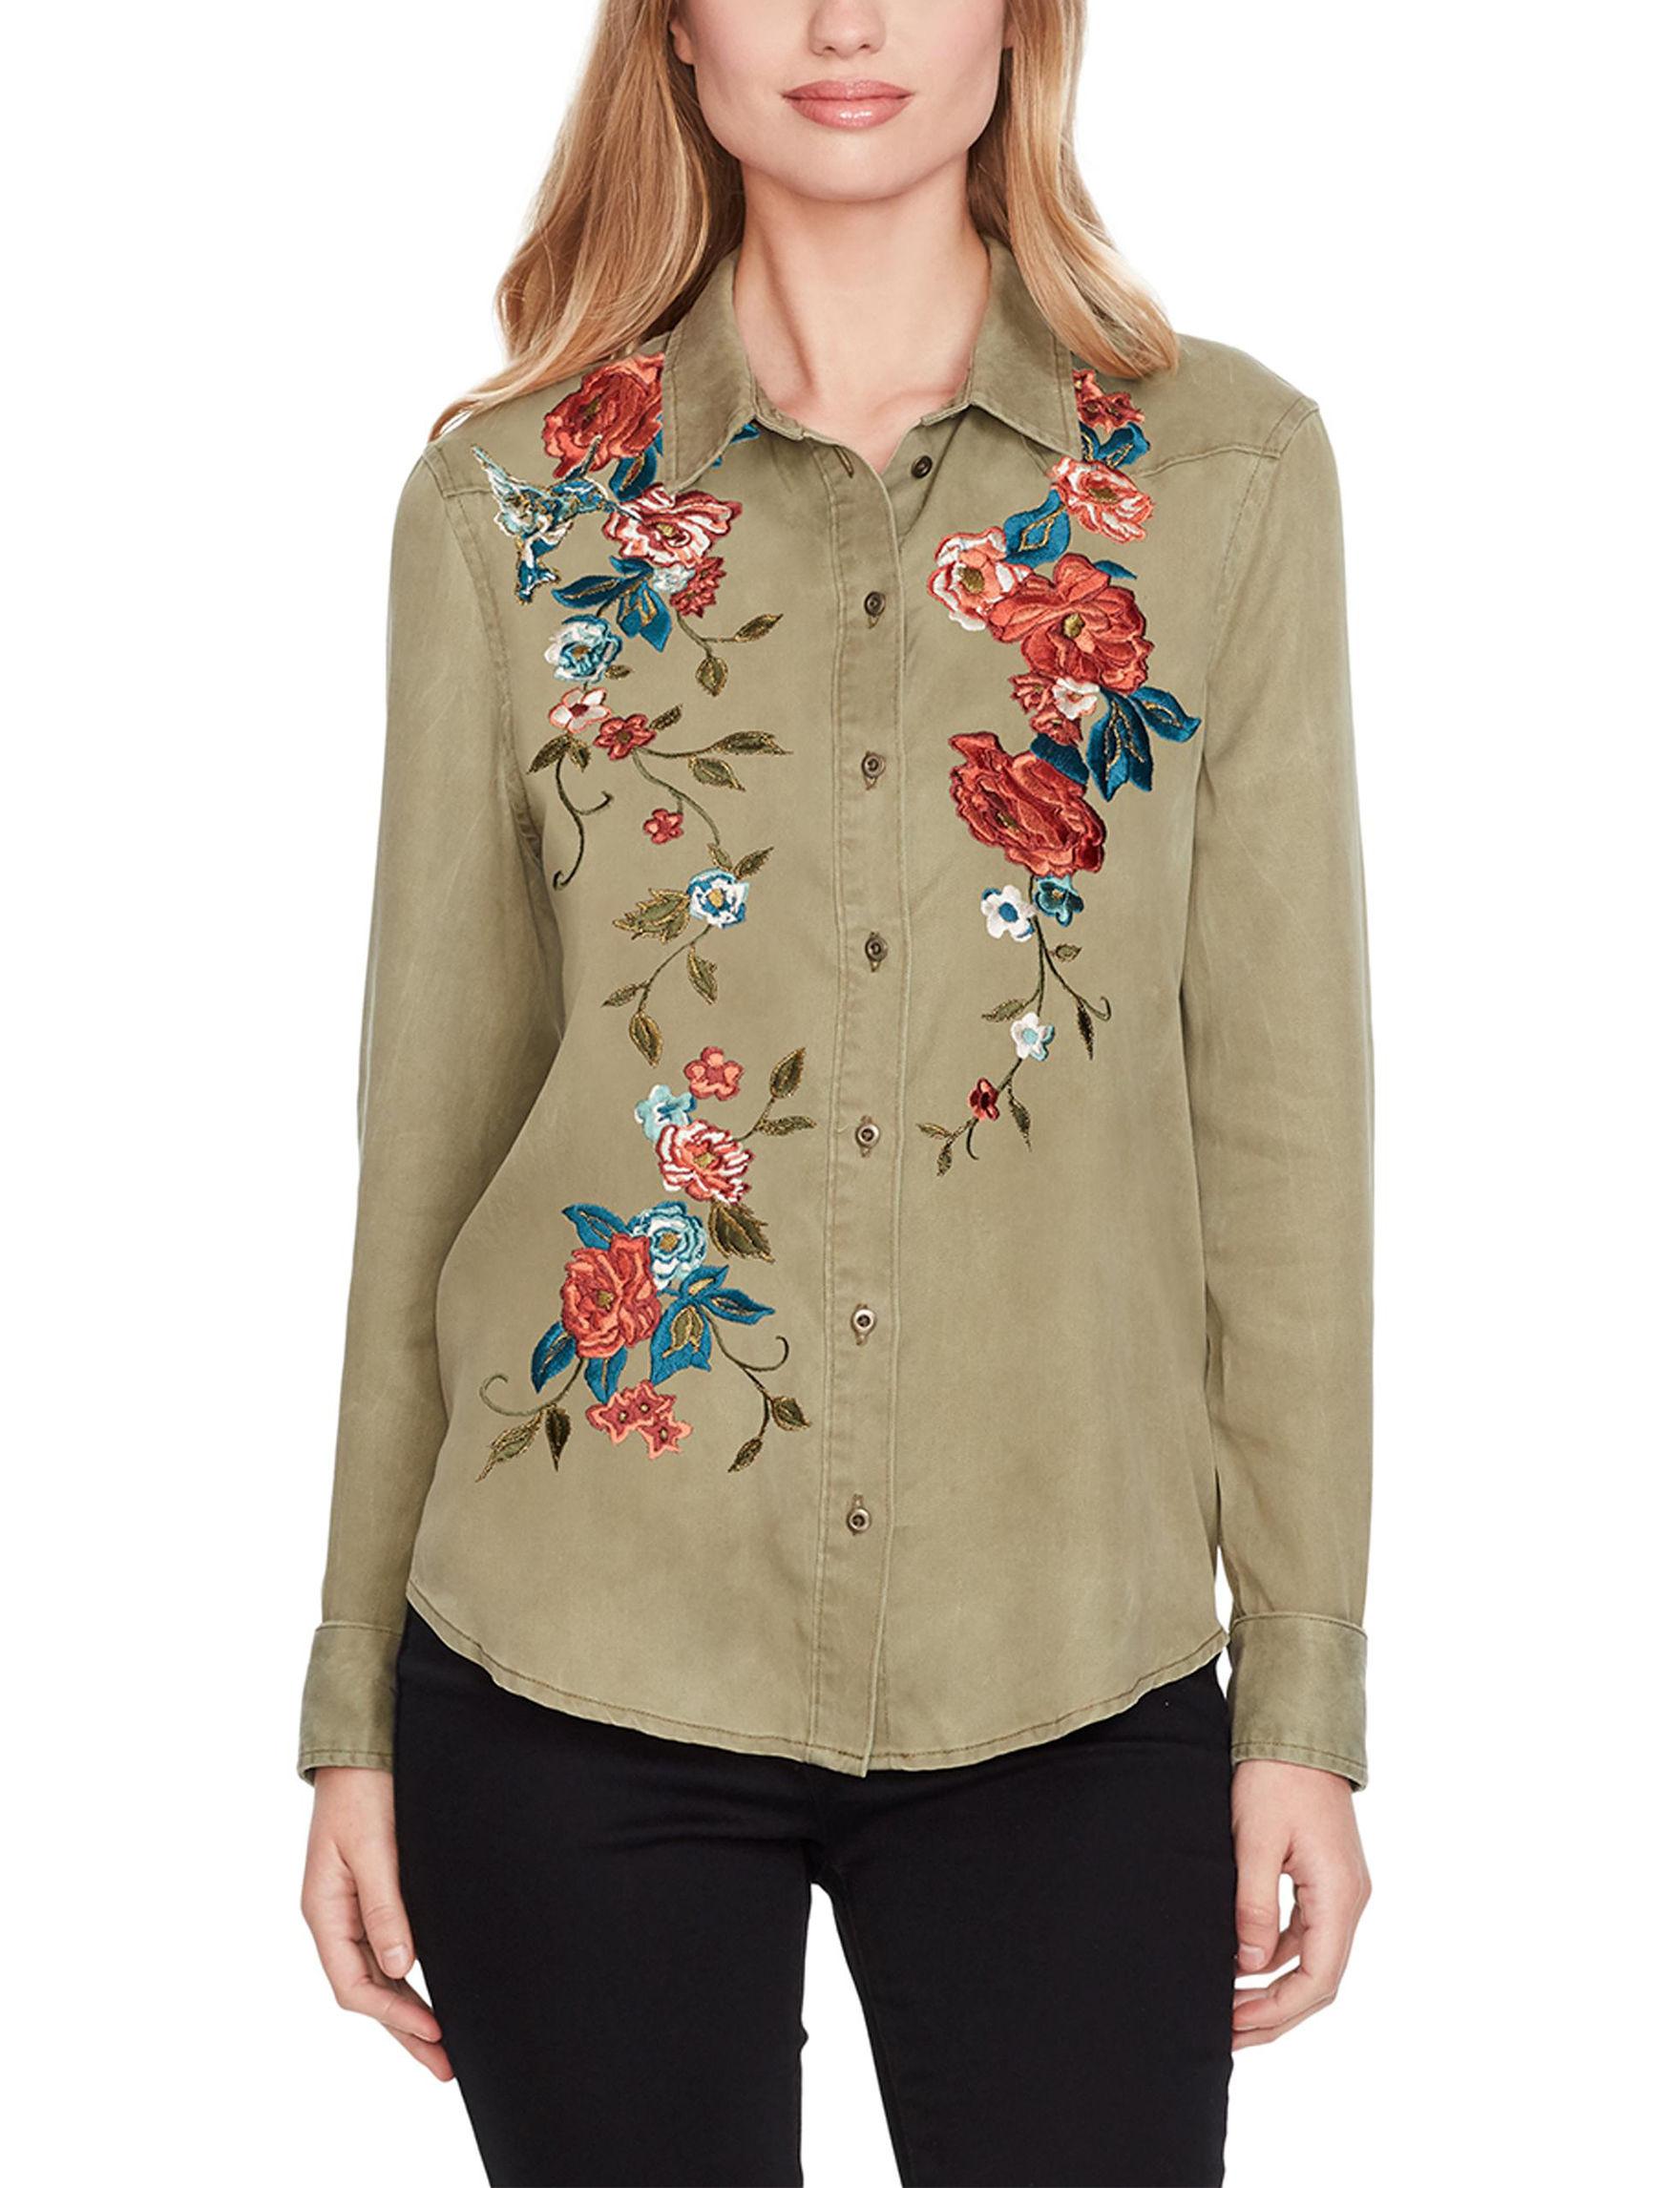 Jessica Simpson Olive Shirts & Blouses